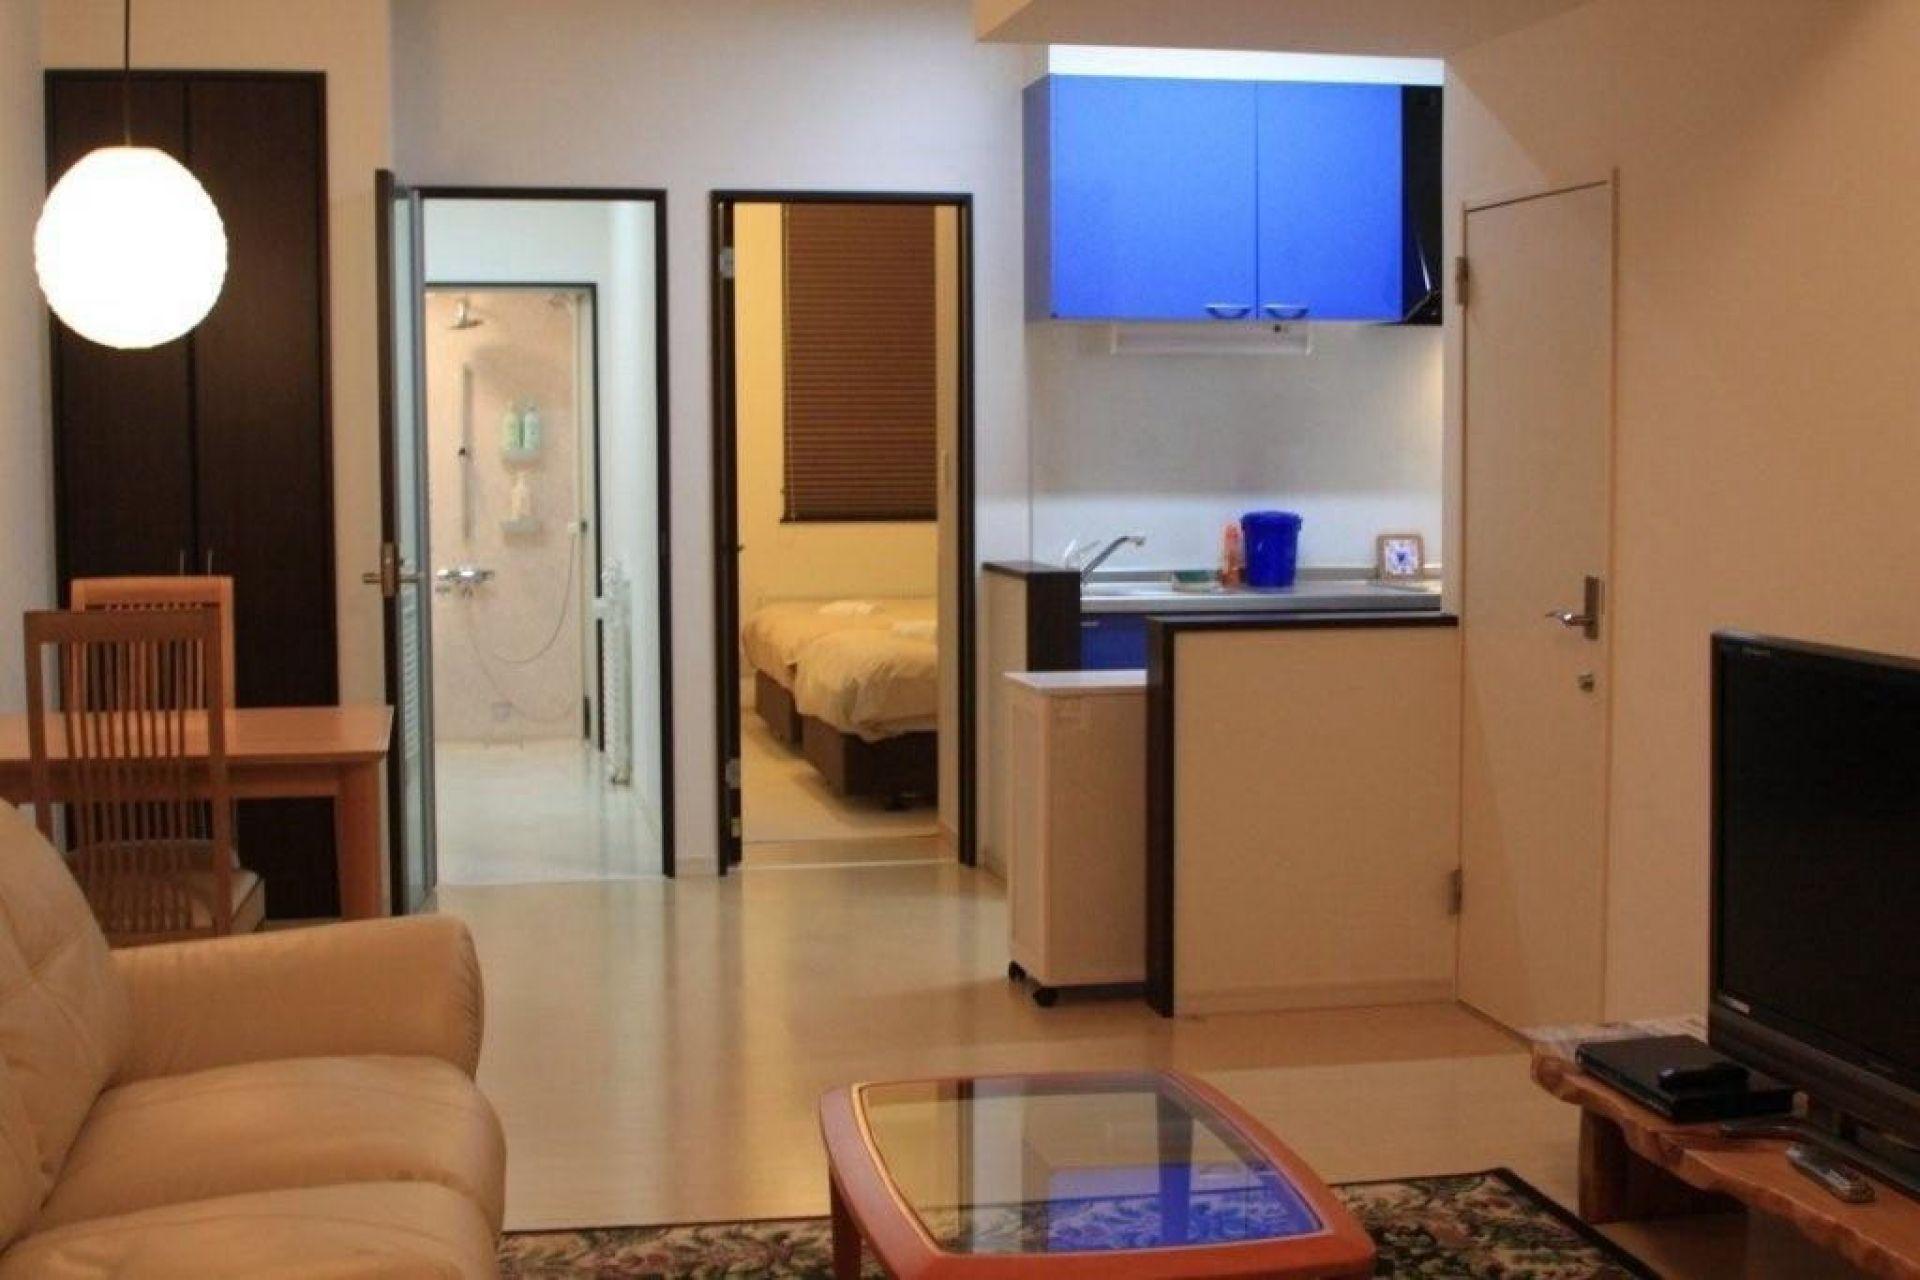 tsuru-apartments-577f0ed64669c_large